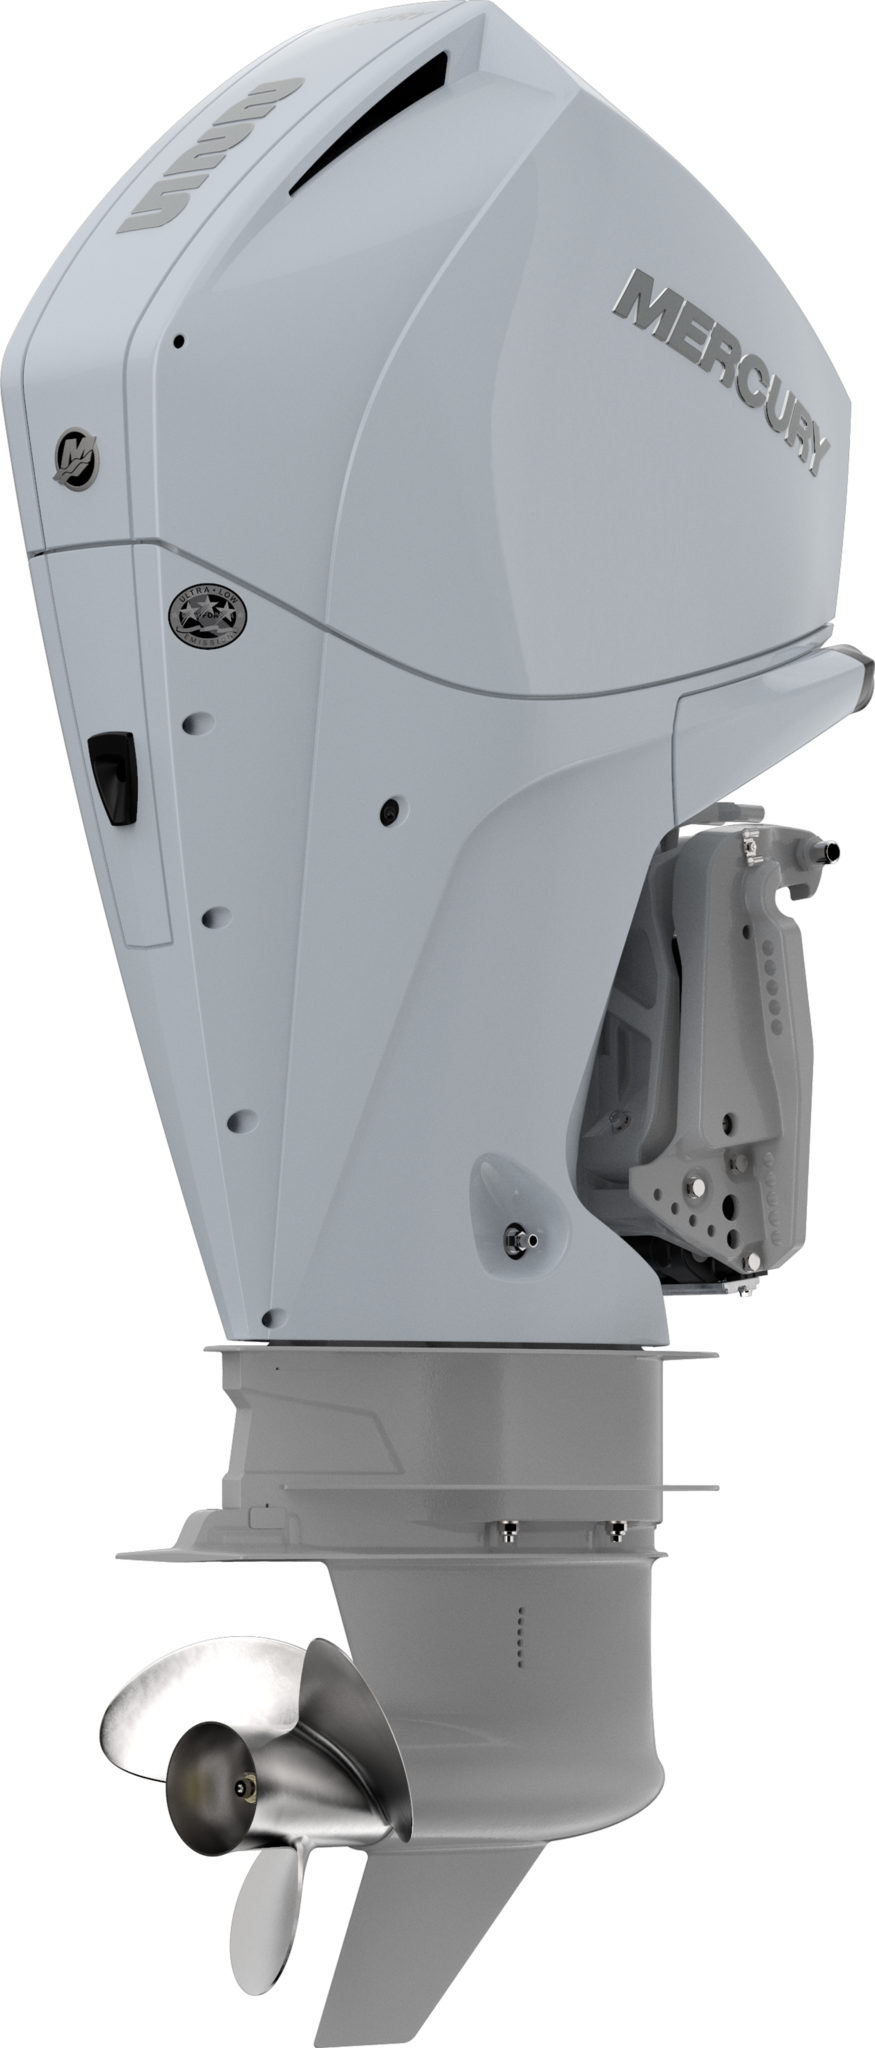 All-New Mercury V-6 Four Stroke, Three Revolutionary Engines